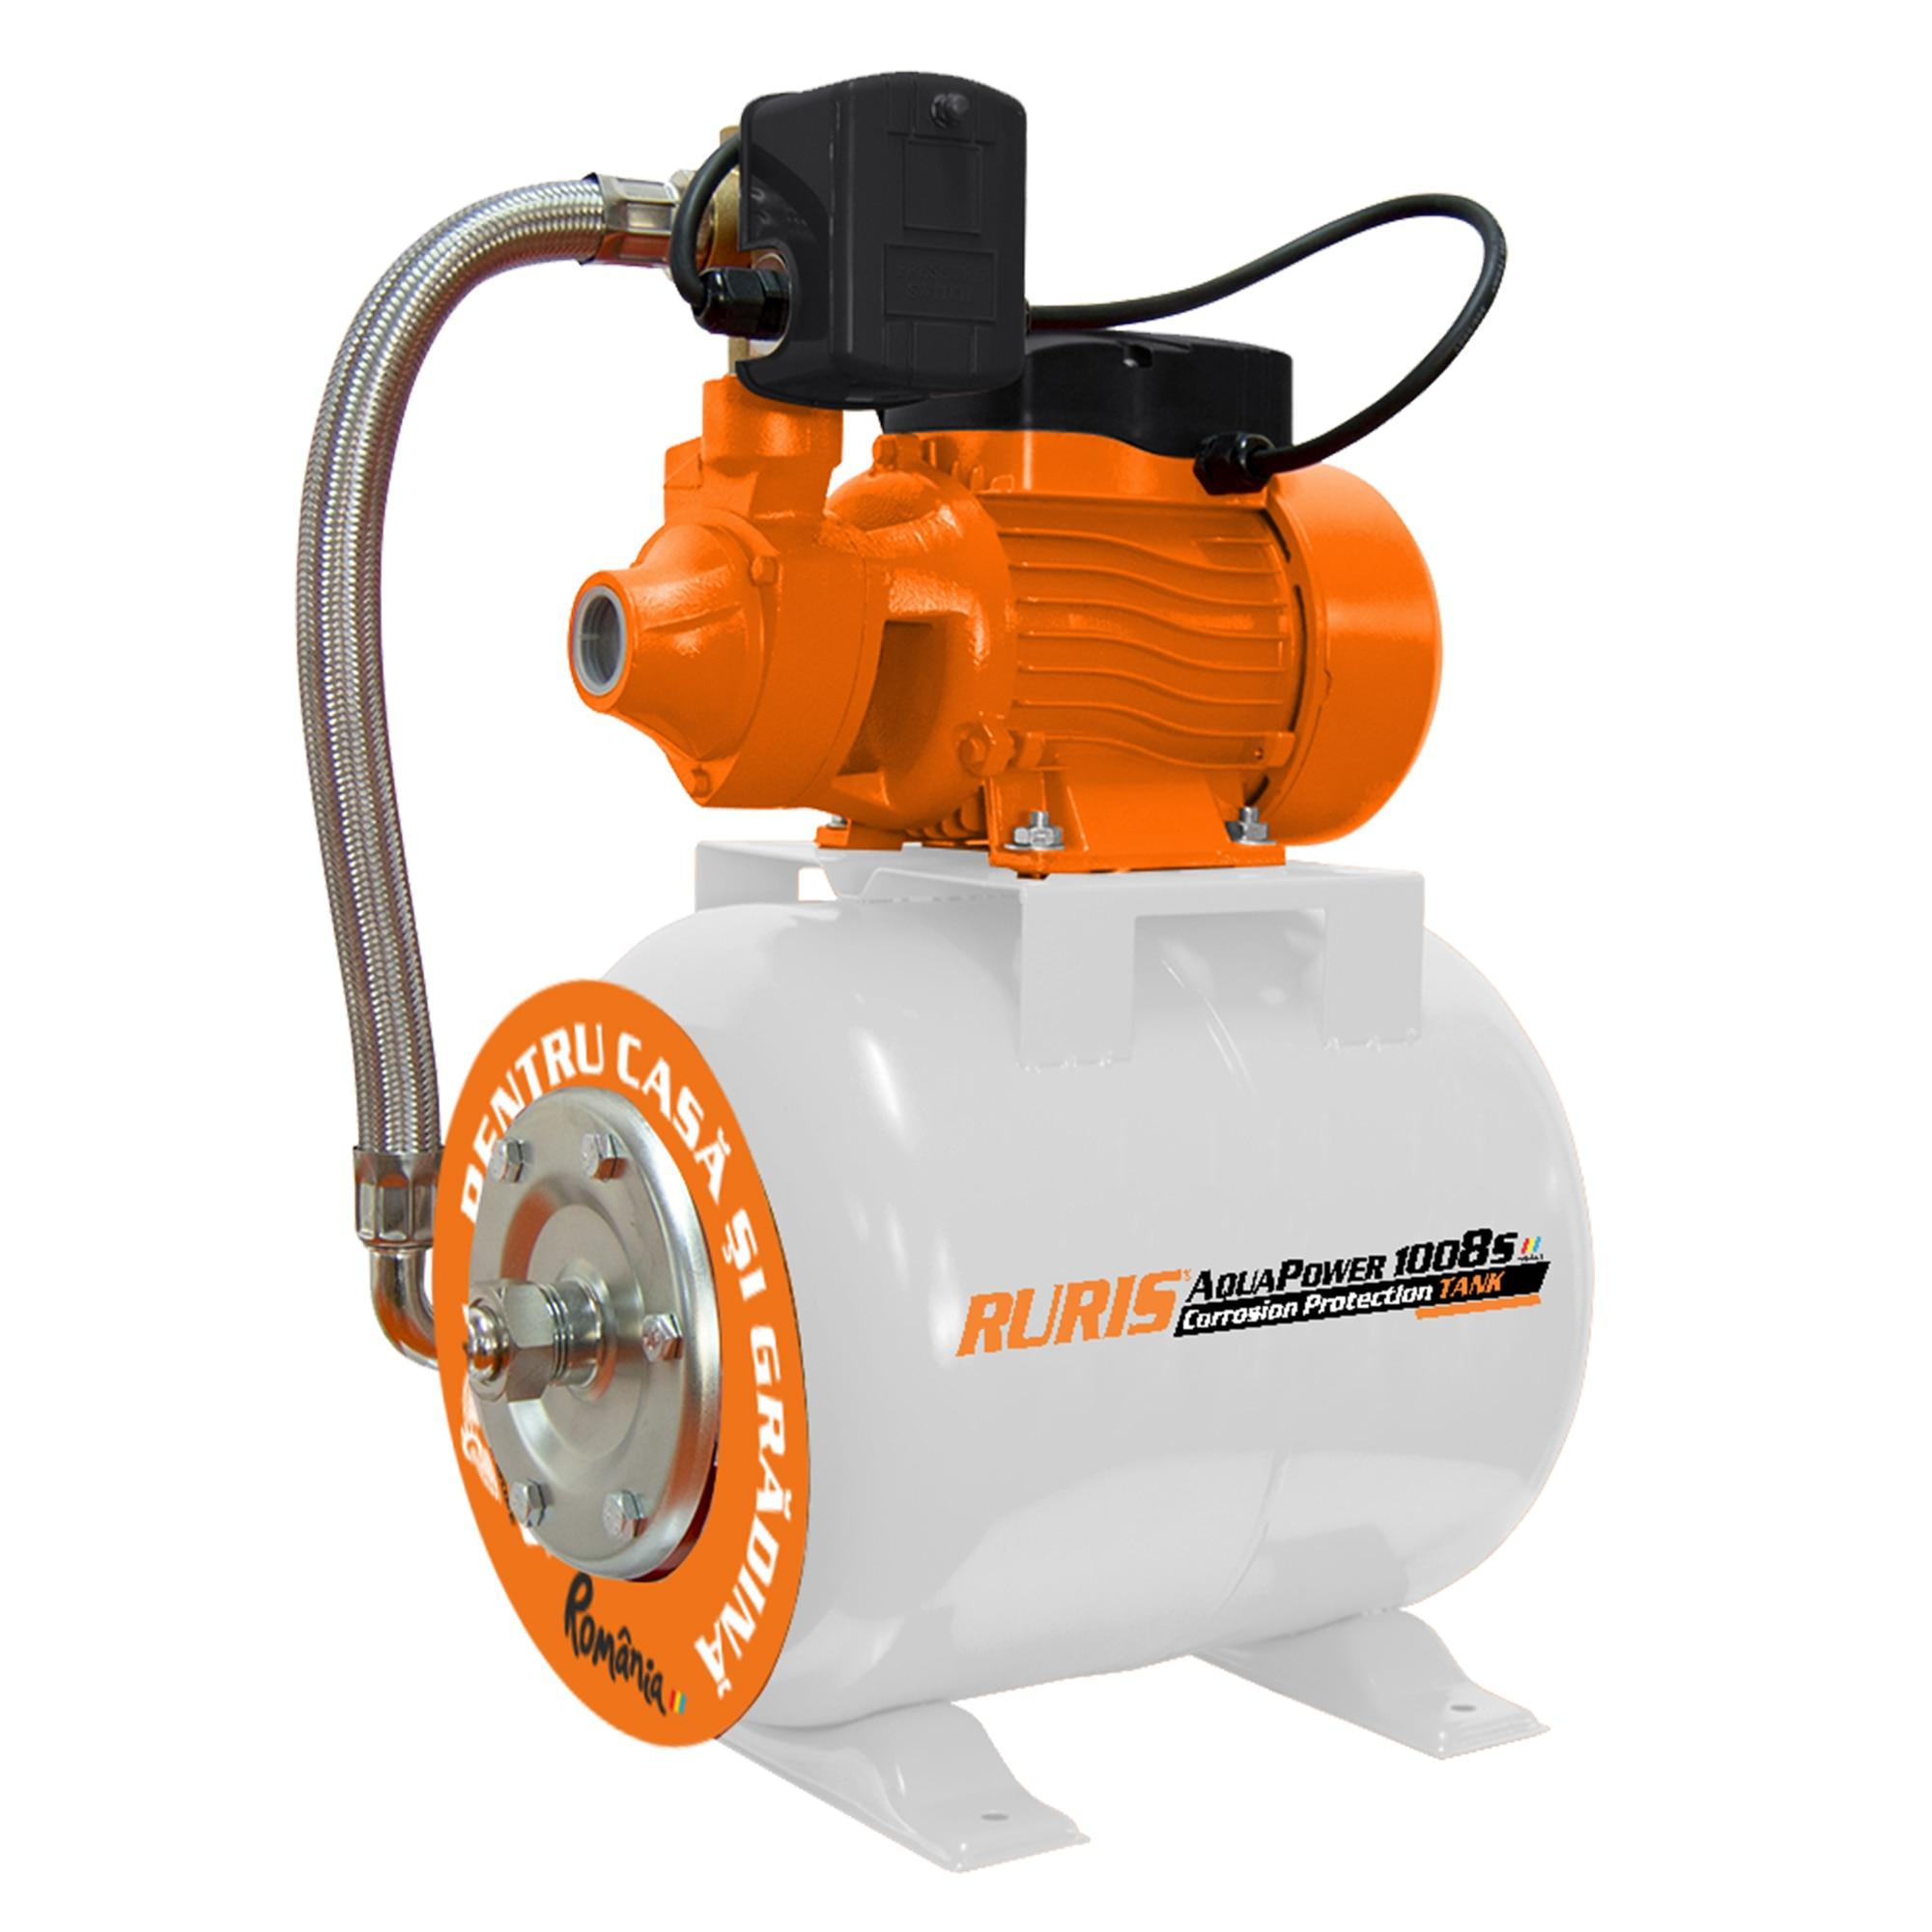 Fotografie Hidrofor RURIS aquapower 1008S, 750 W, 19 l, debit 46 l/min, refulare 45 m inaltime refulare, 9 m adancime absorbtie